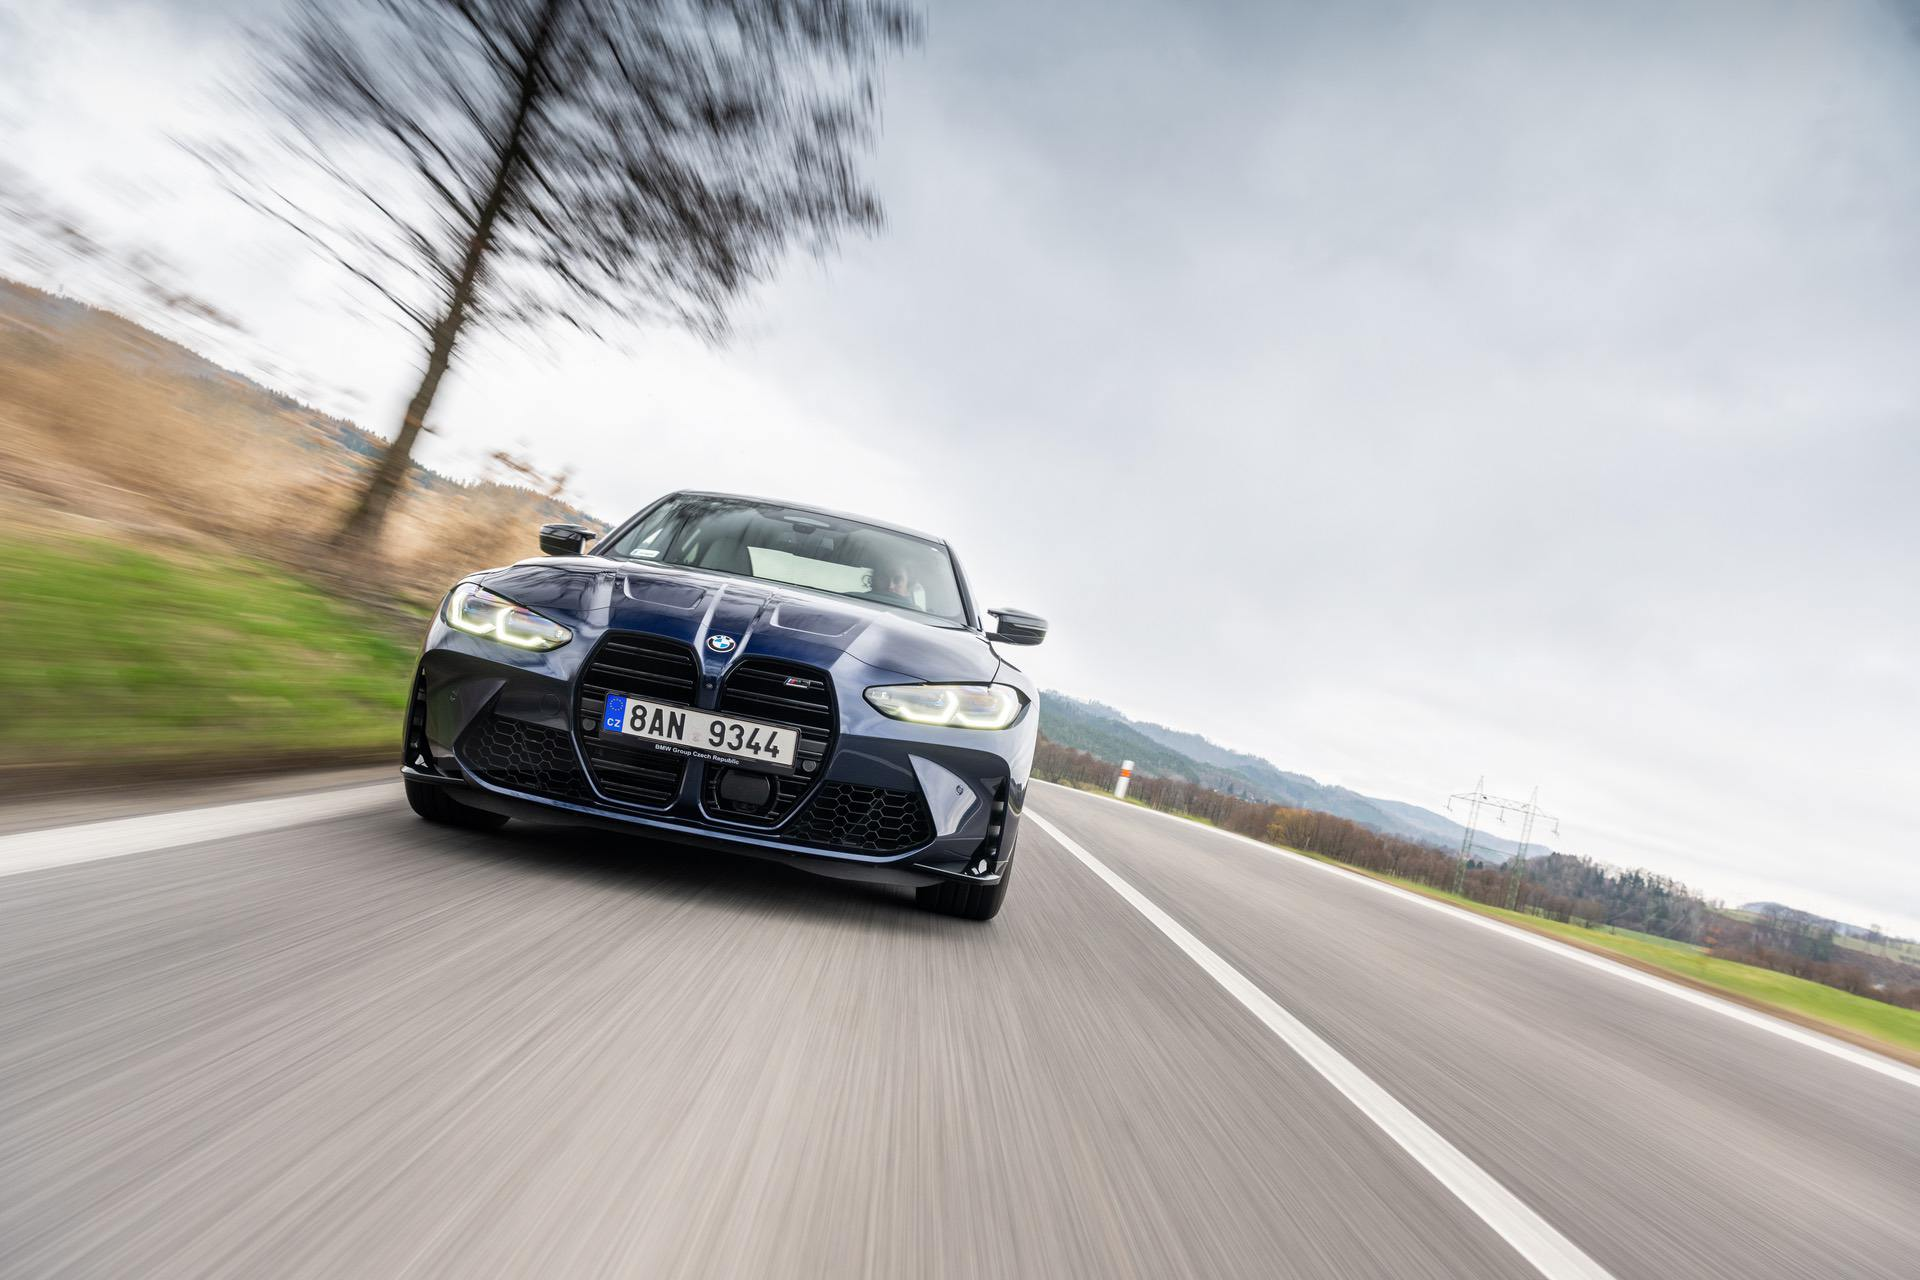 VIDEO: AutoTopNL's Zanzibar Metallic BMW M3 Goes on a Dyno